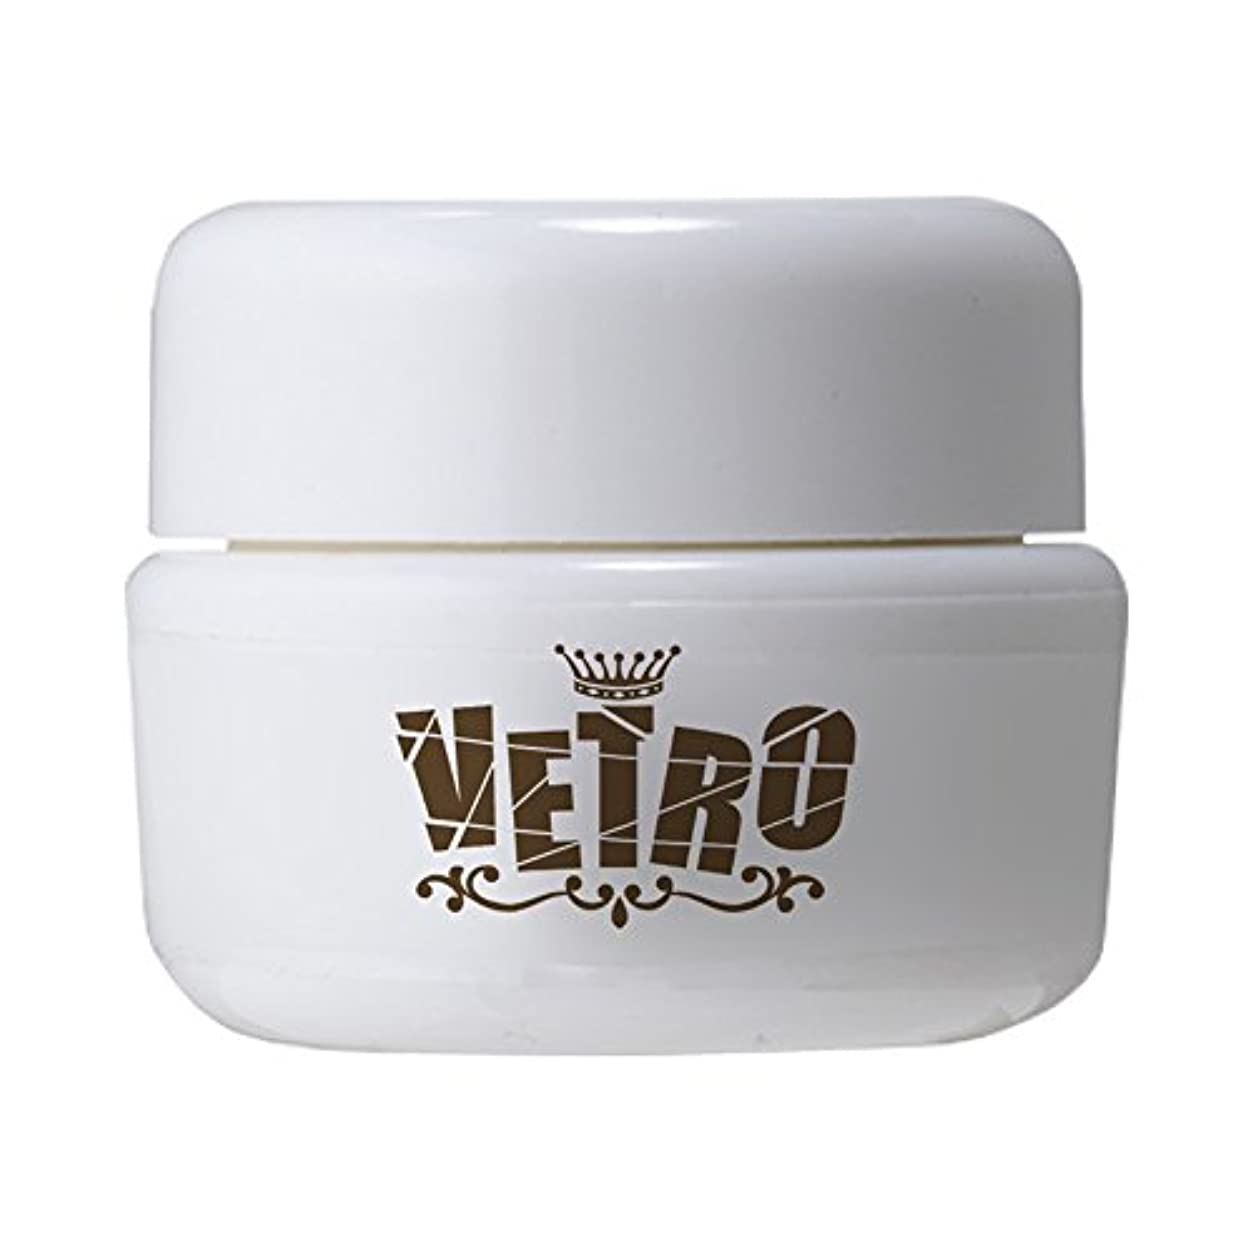 VETRO No.19 カラージェル マット VL341 プリティウーマン 4ml